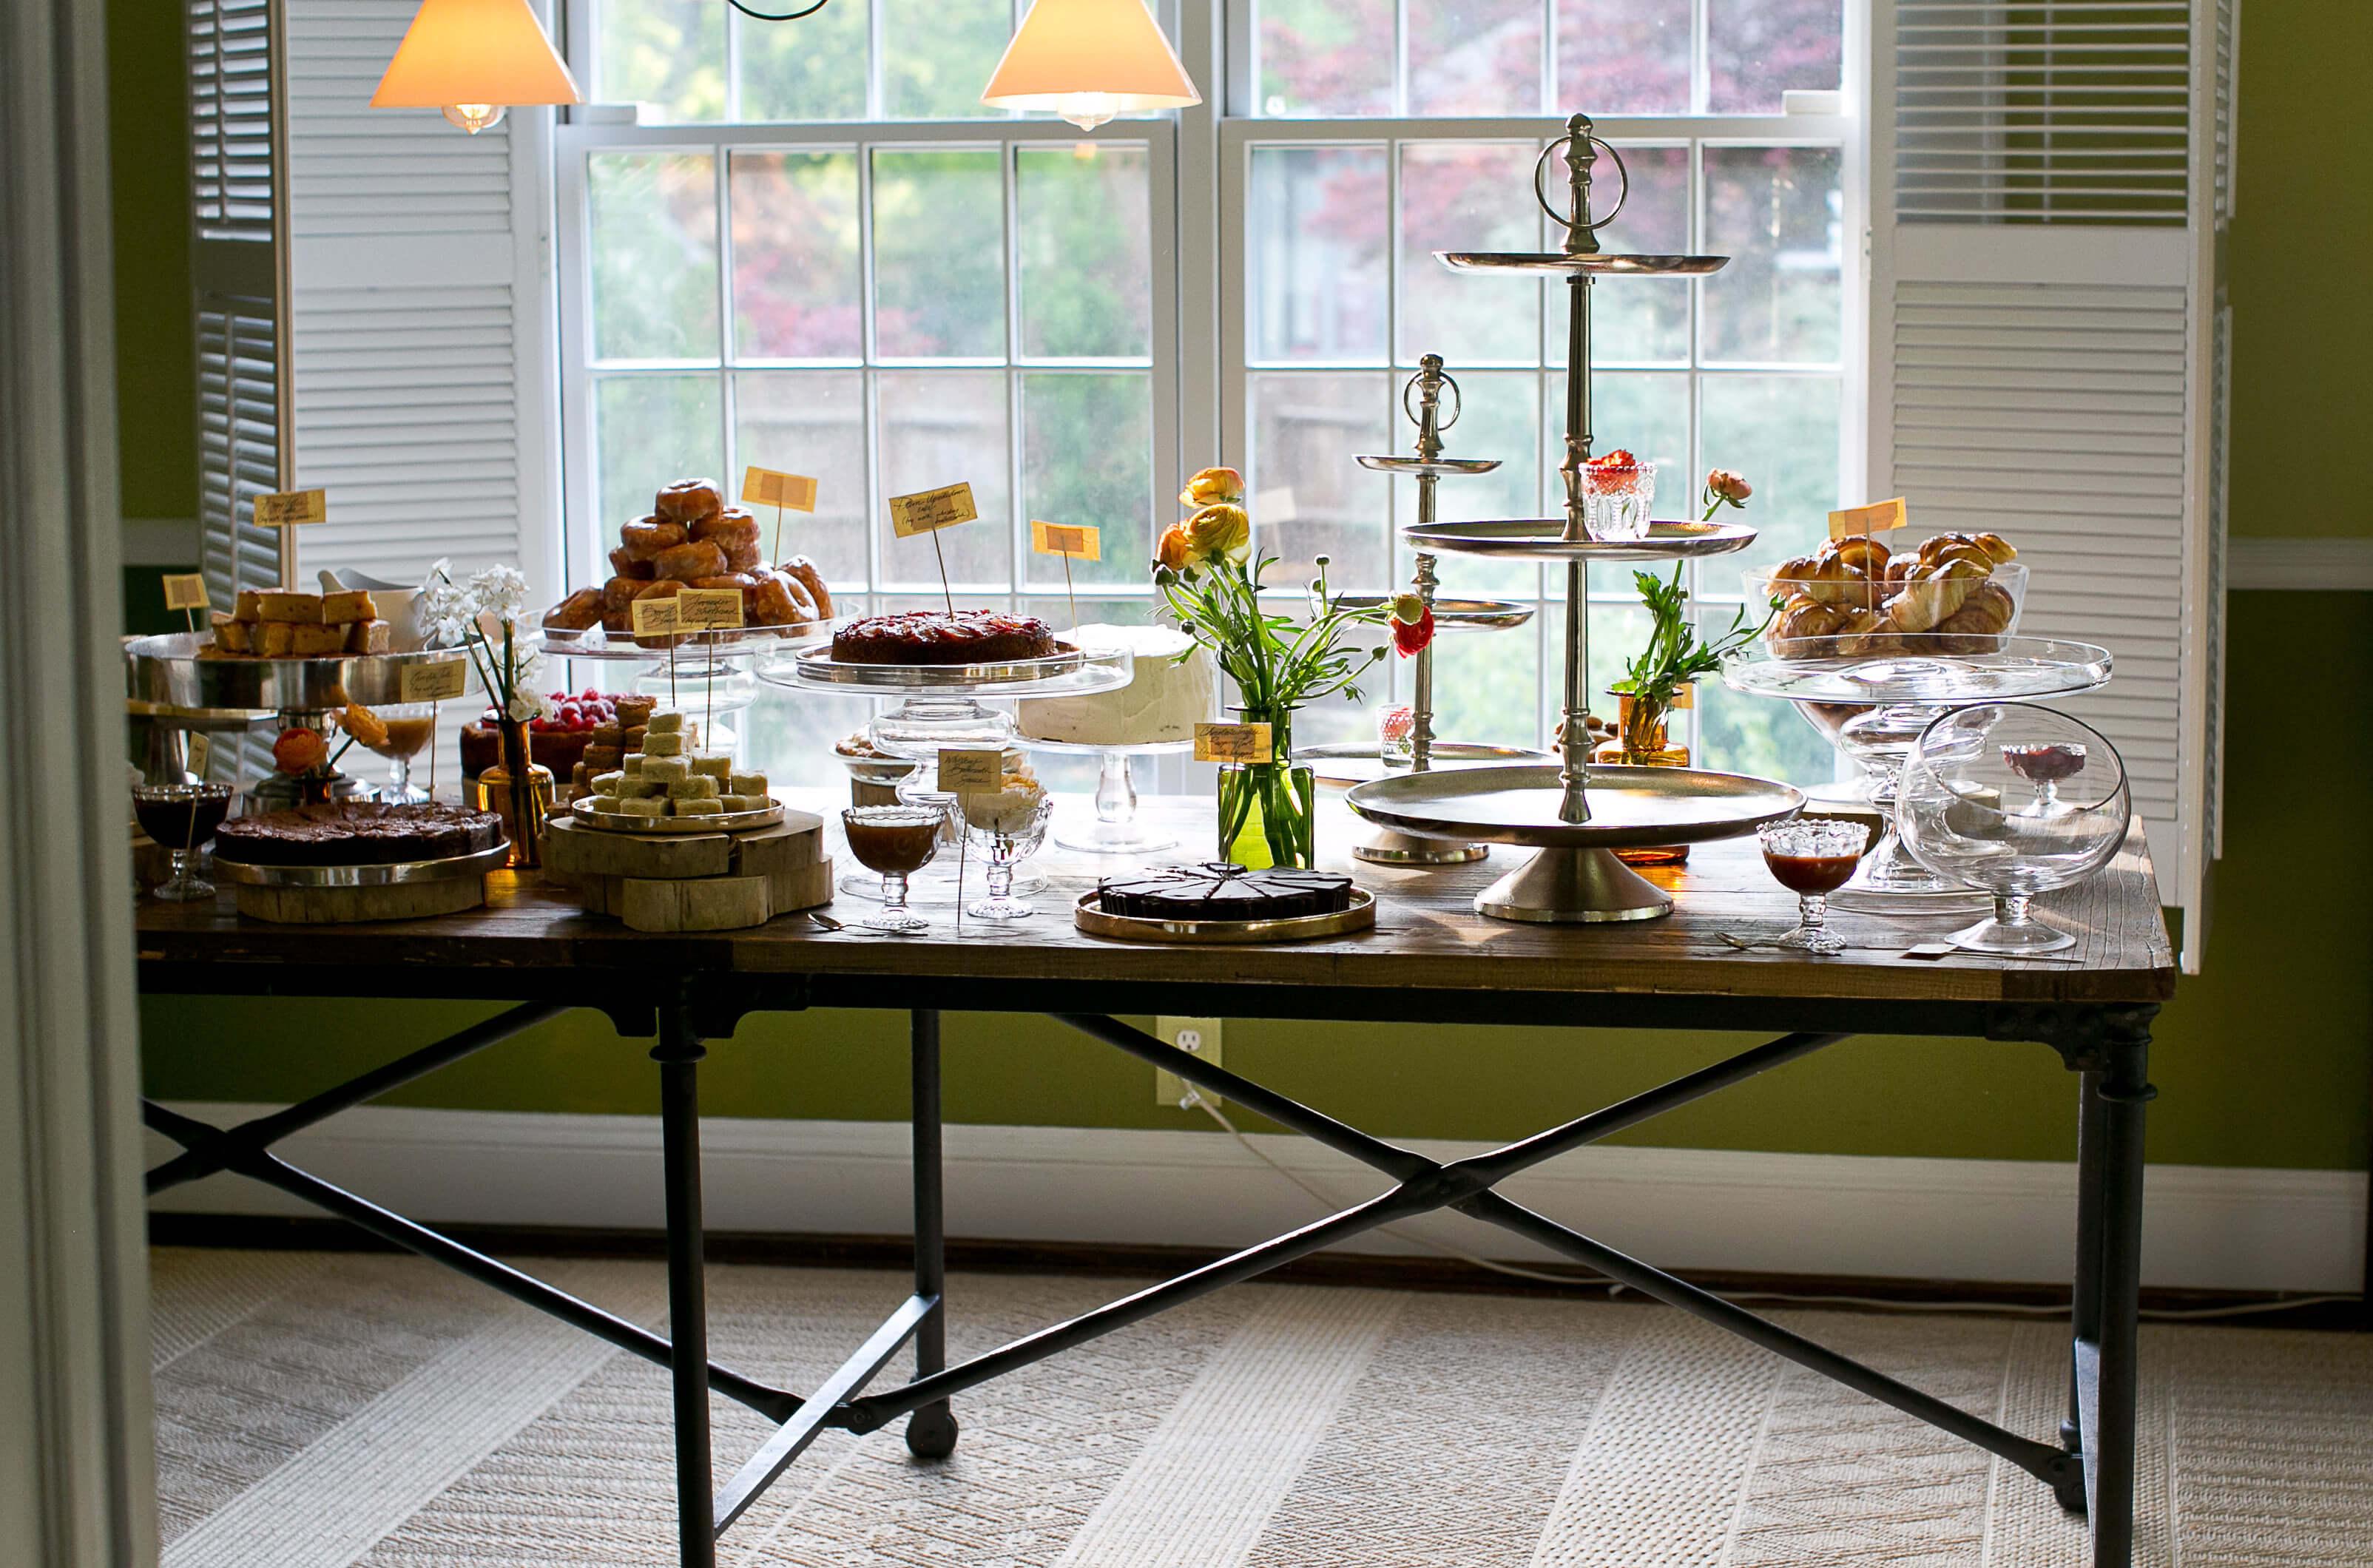 3-Tier Metal Dessert Stand 20in, Penelope Table